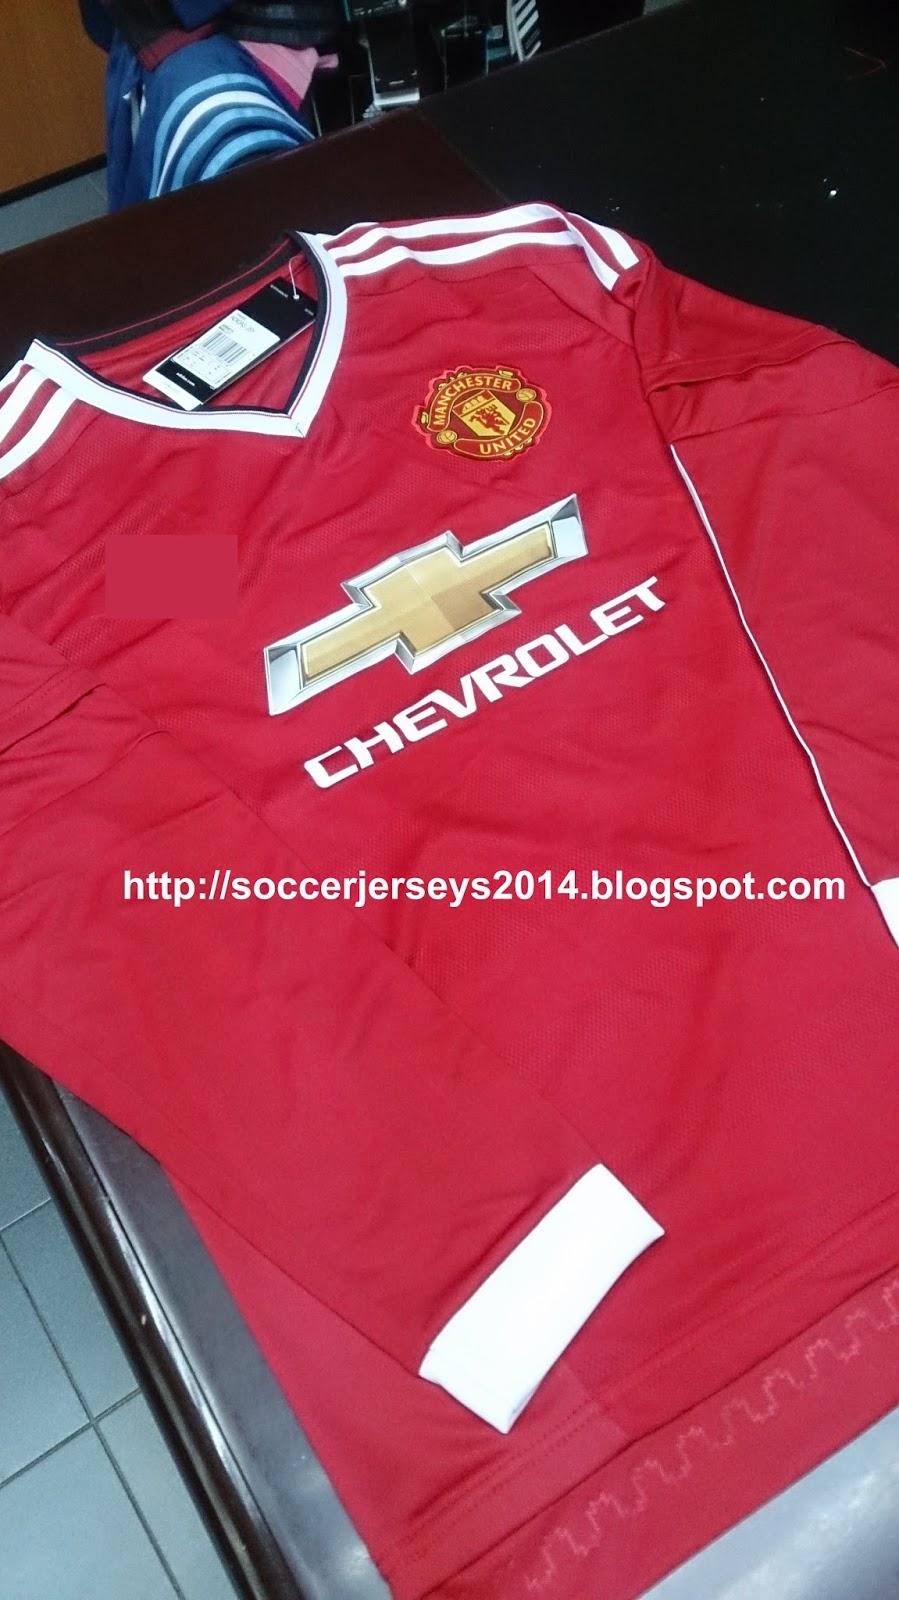 brand new cf457 e3df4 Soccer Jerseys 2014: Manchester United Home Long Sleeve 2015 ...